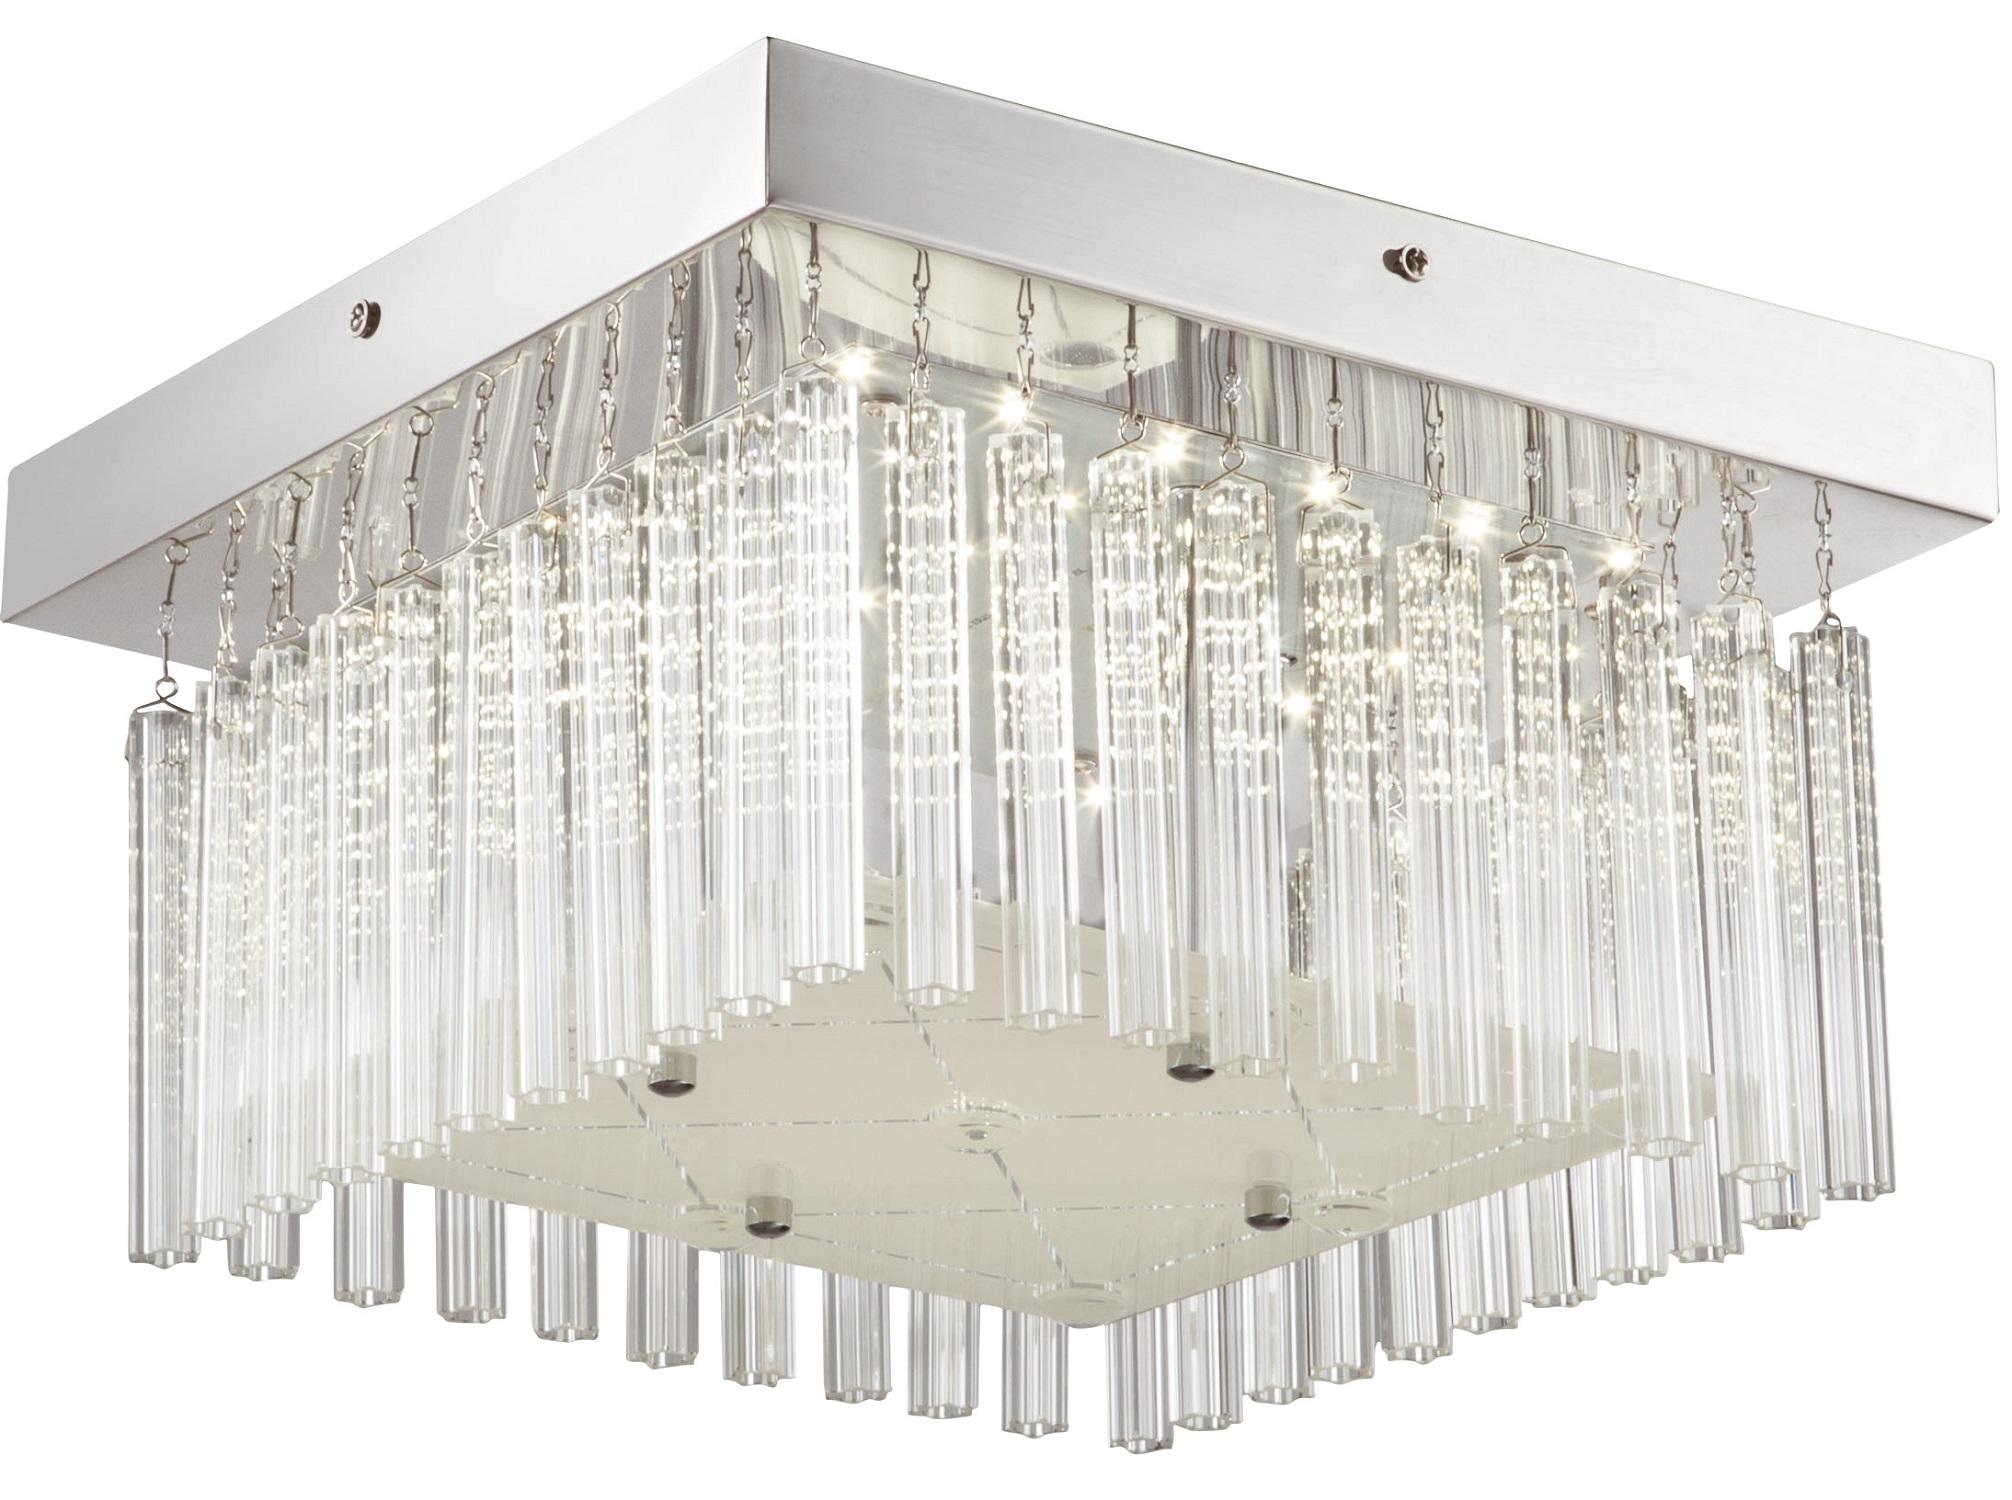 Светильник потолочныйПотолочные светильники<br>&amp;lt;div&amp;gt;&amp;lt;div&amp;gt;Вид цоколя: LED&amp;lt;/div&amp;gt;&amp;lt;div&amp;gt;Мощность: &amp;amp;nbsp;18W&amp;amp;nbsp;&amp;lt;/div&amp;gt;&amp;lt;div&amp;gt;Количество ламп: 1 (в комплекте)&amp;lt;/div&amp;gt;&amp;lt;/div&amp;gt;<br><br>Material: Стекло<br>Length см: None<br>Width см: 30<br>Depth см: 30<br>Height см: 18,5<br>Diameter см: None